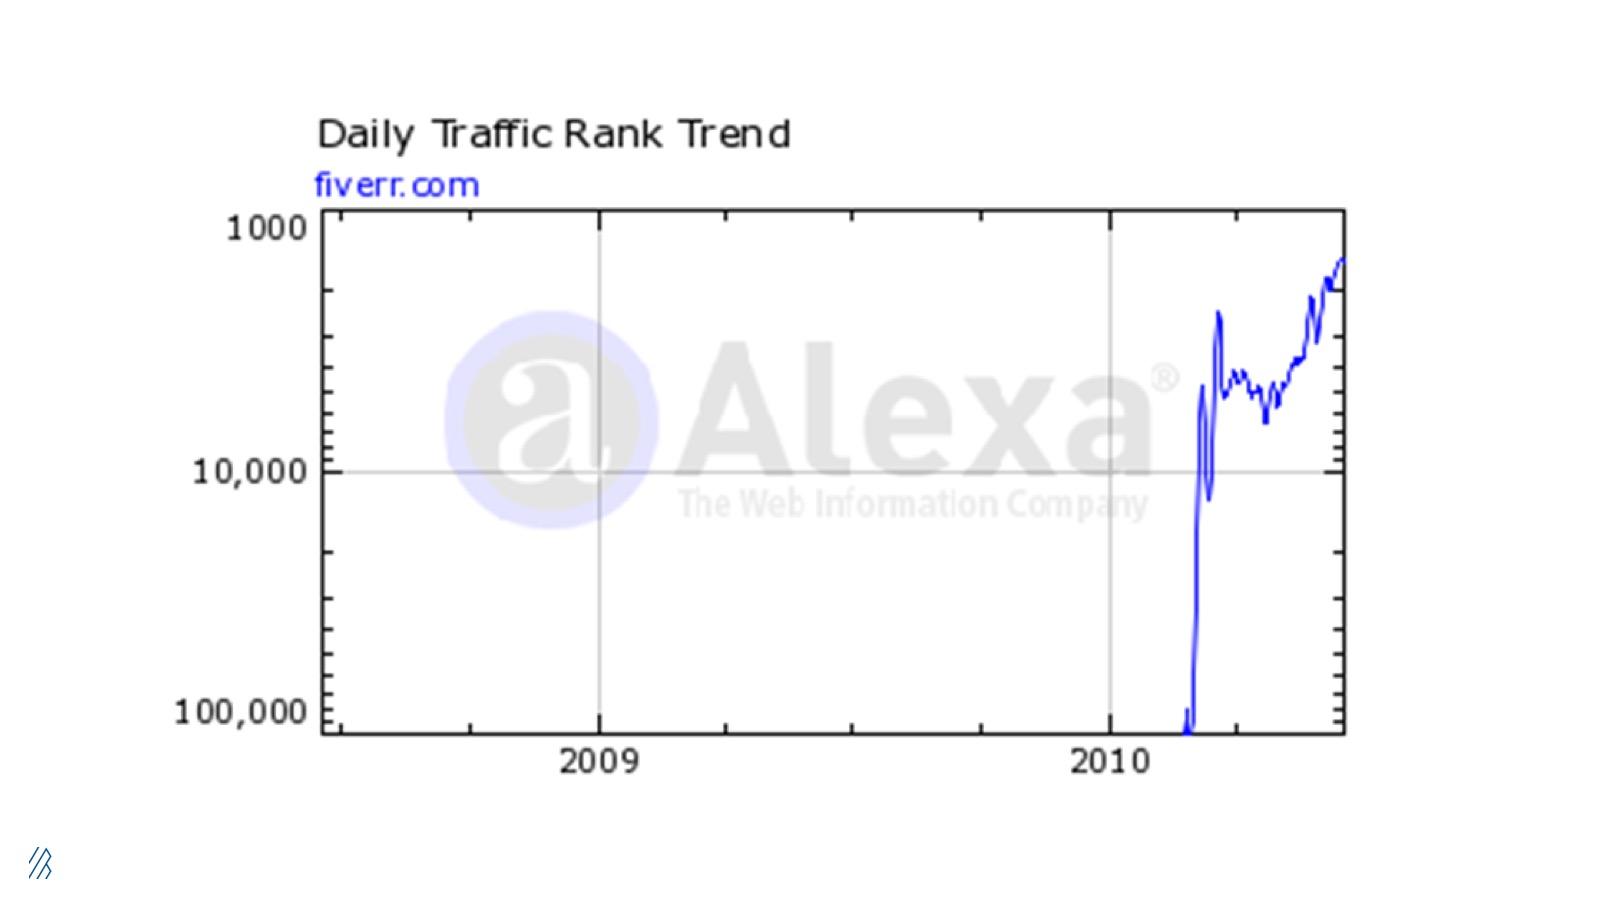 Alexa data of Fiverr's daily traffic rank trend in 2010